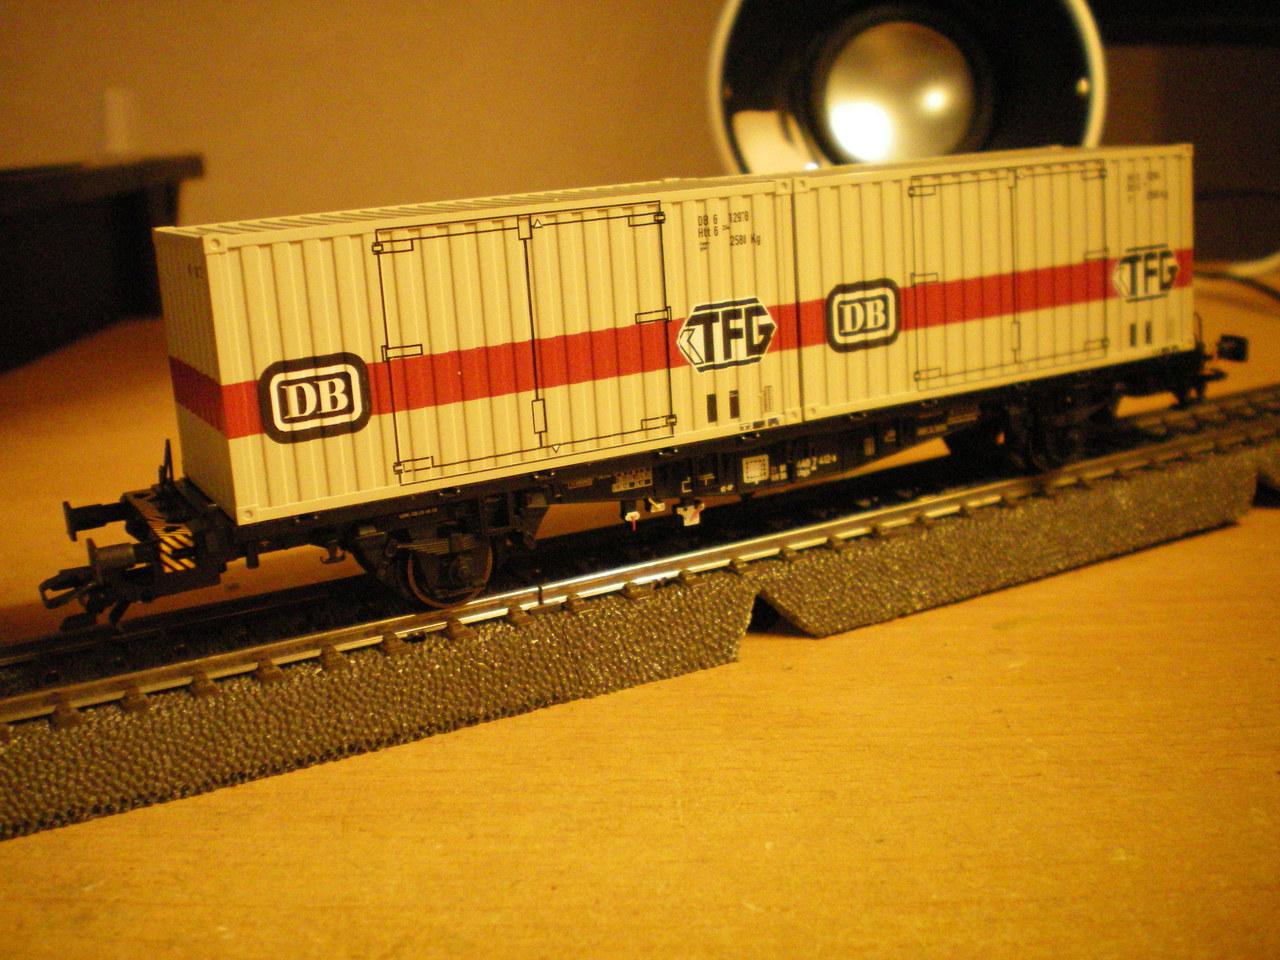 Container-Tragwagenset 47689 100_0009cfs2y